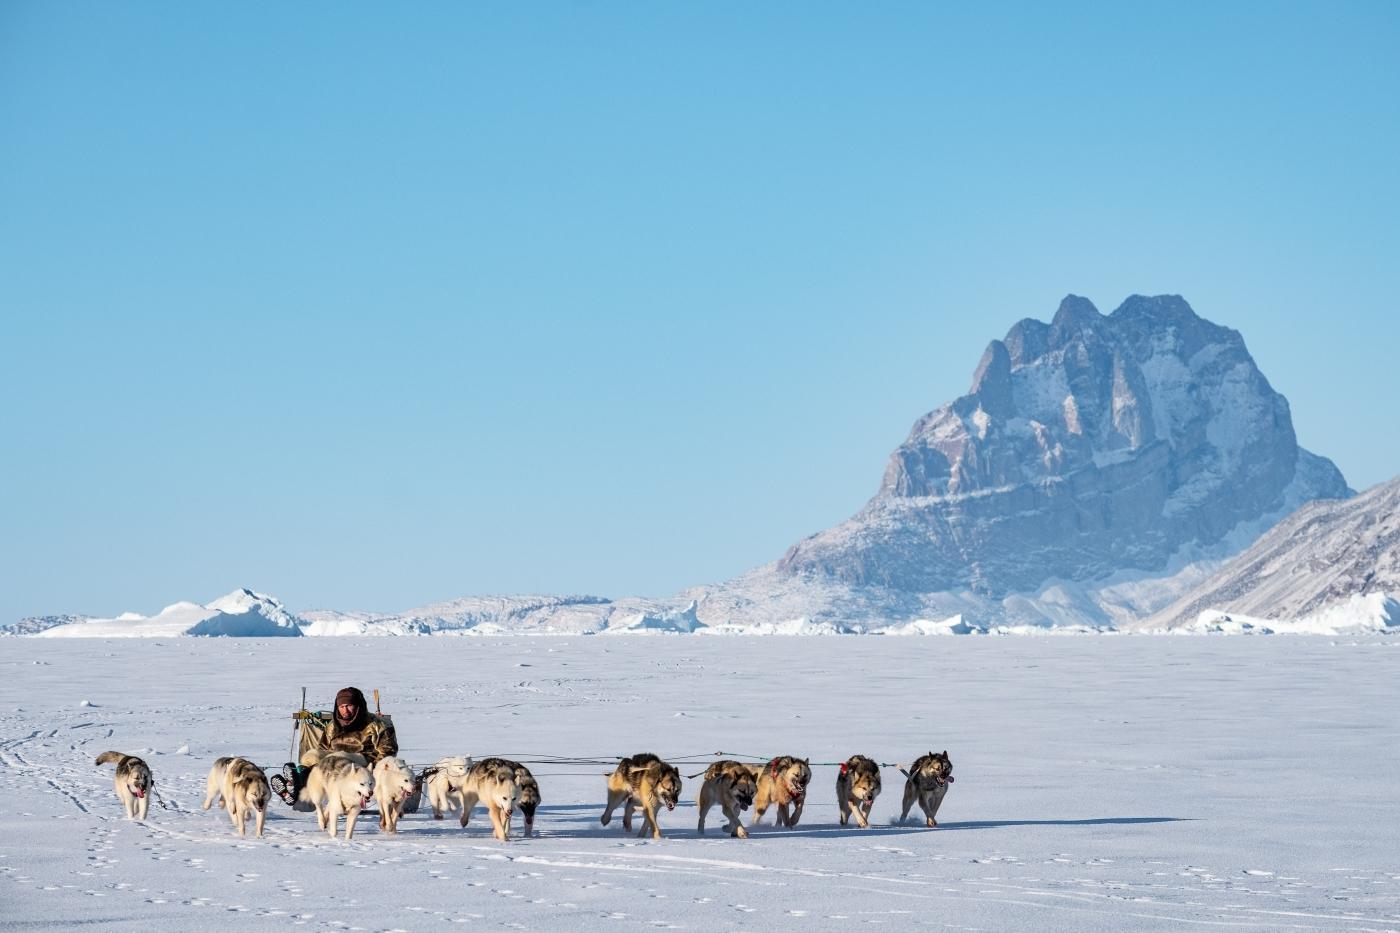 Dogsled near the Uummannaq mountain. Photo by Lasse Kyed